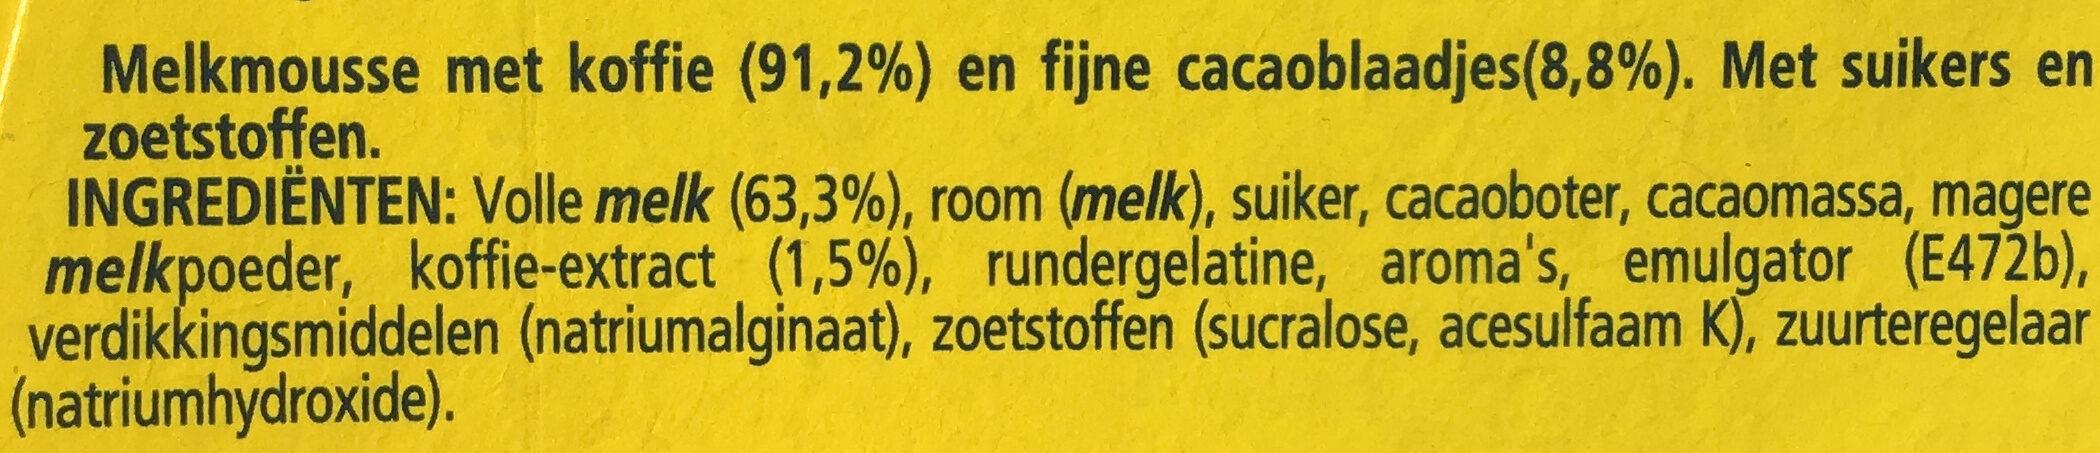 Feuilleté de mousse café - Ingrediënten - nl